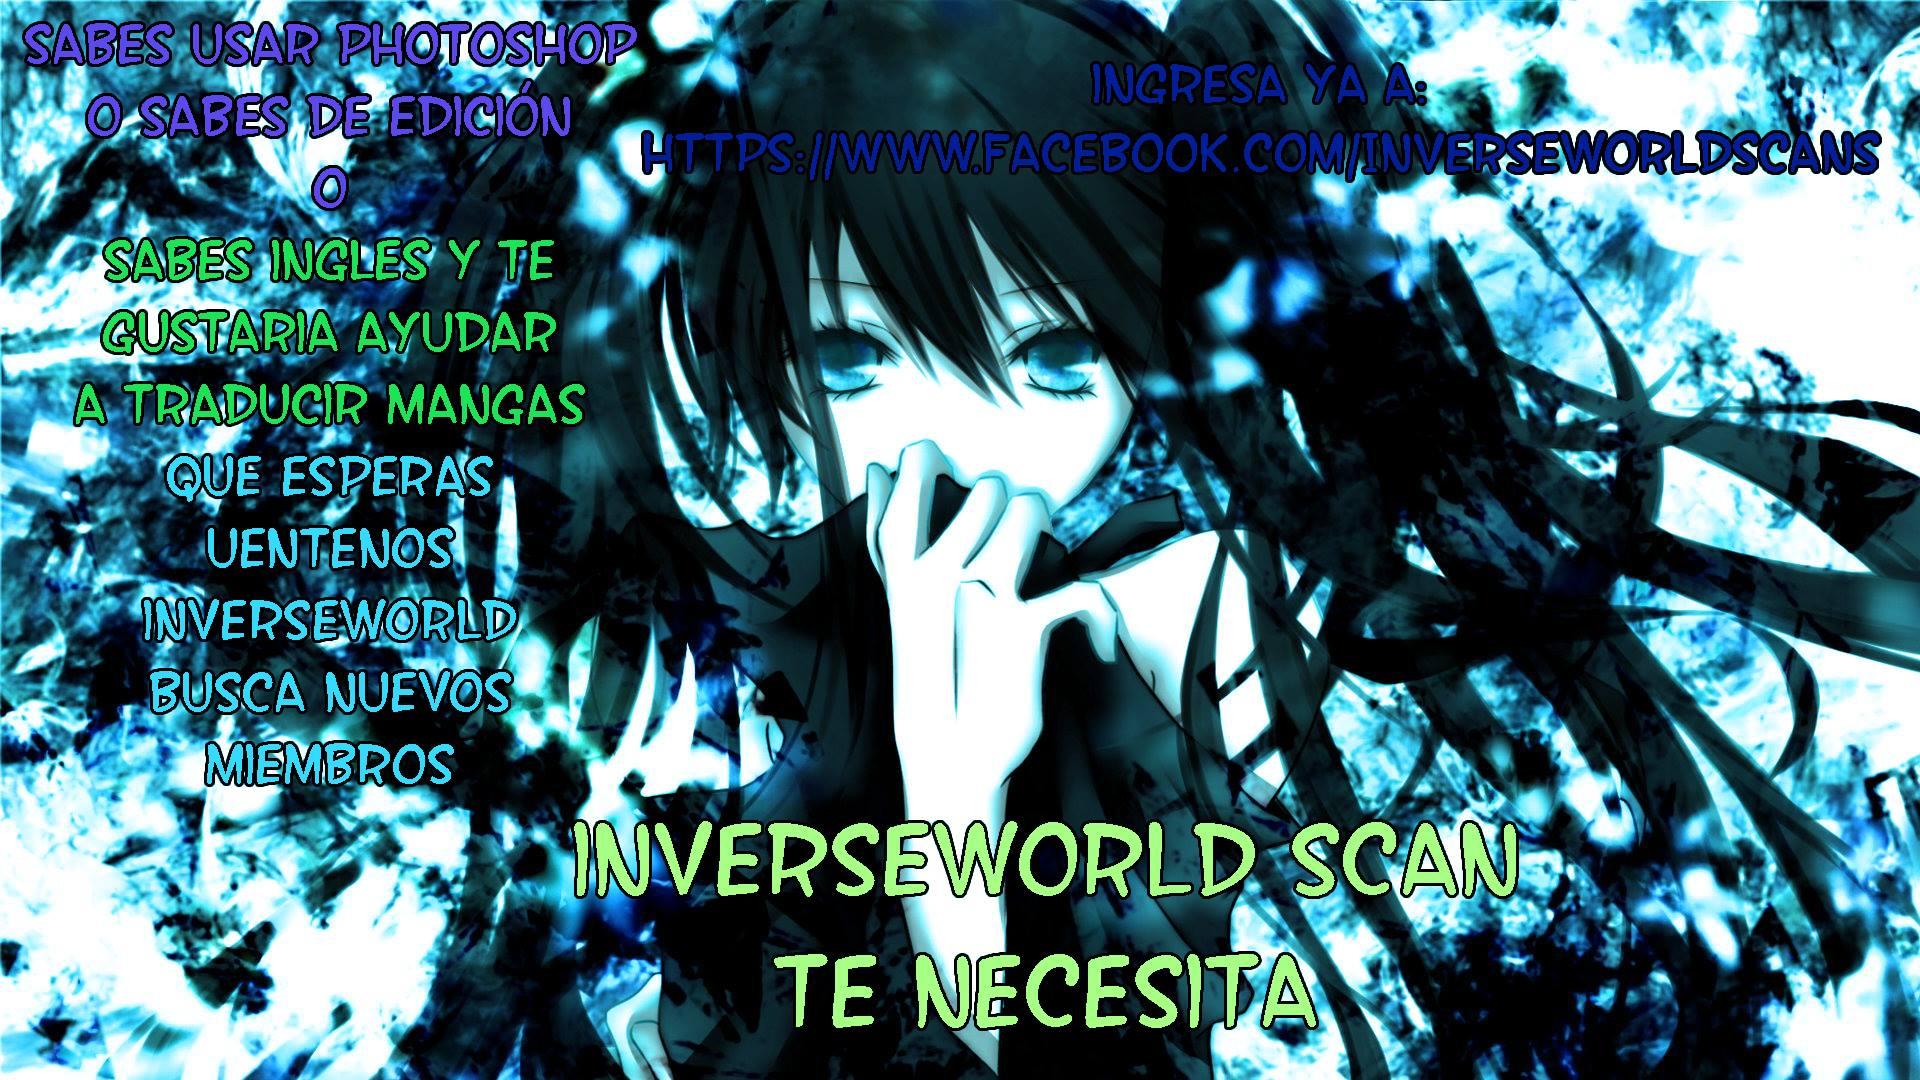 https://c5.mangatag.com/es_manga/18/16210/415329/37624b36da4d07cf5177e2b6fed5f7a5.jpg Page 2